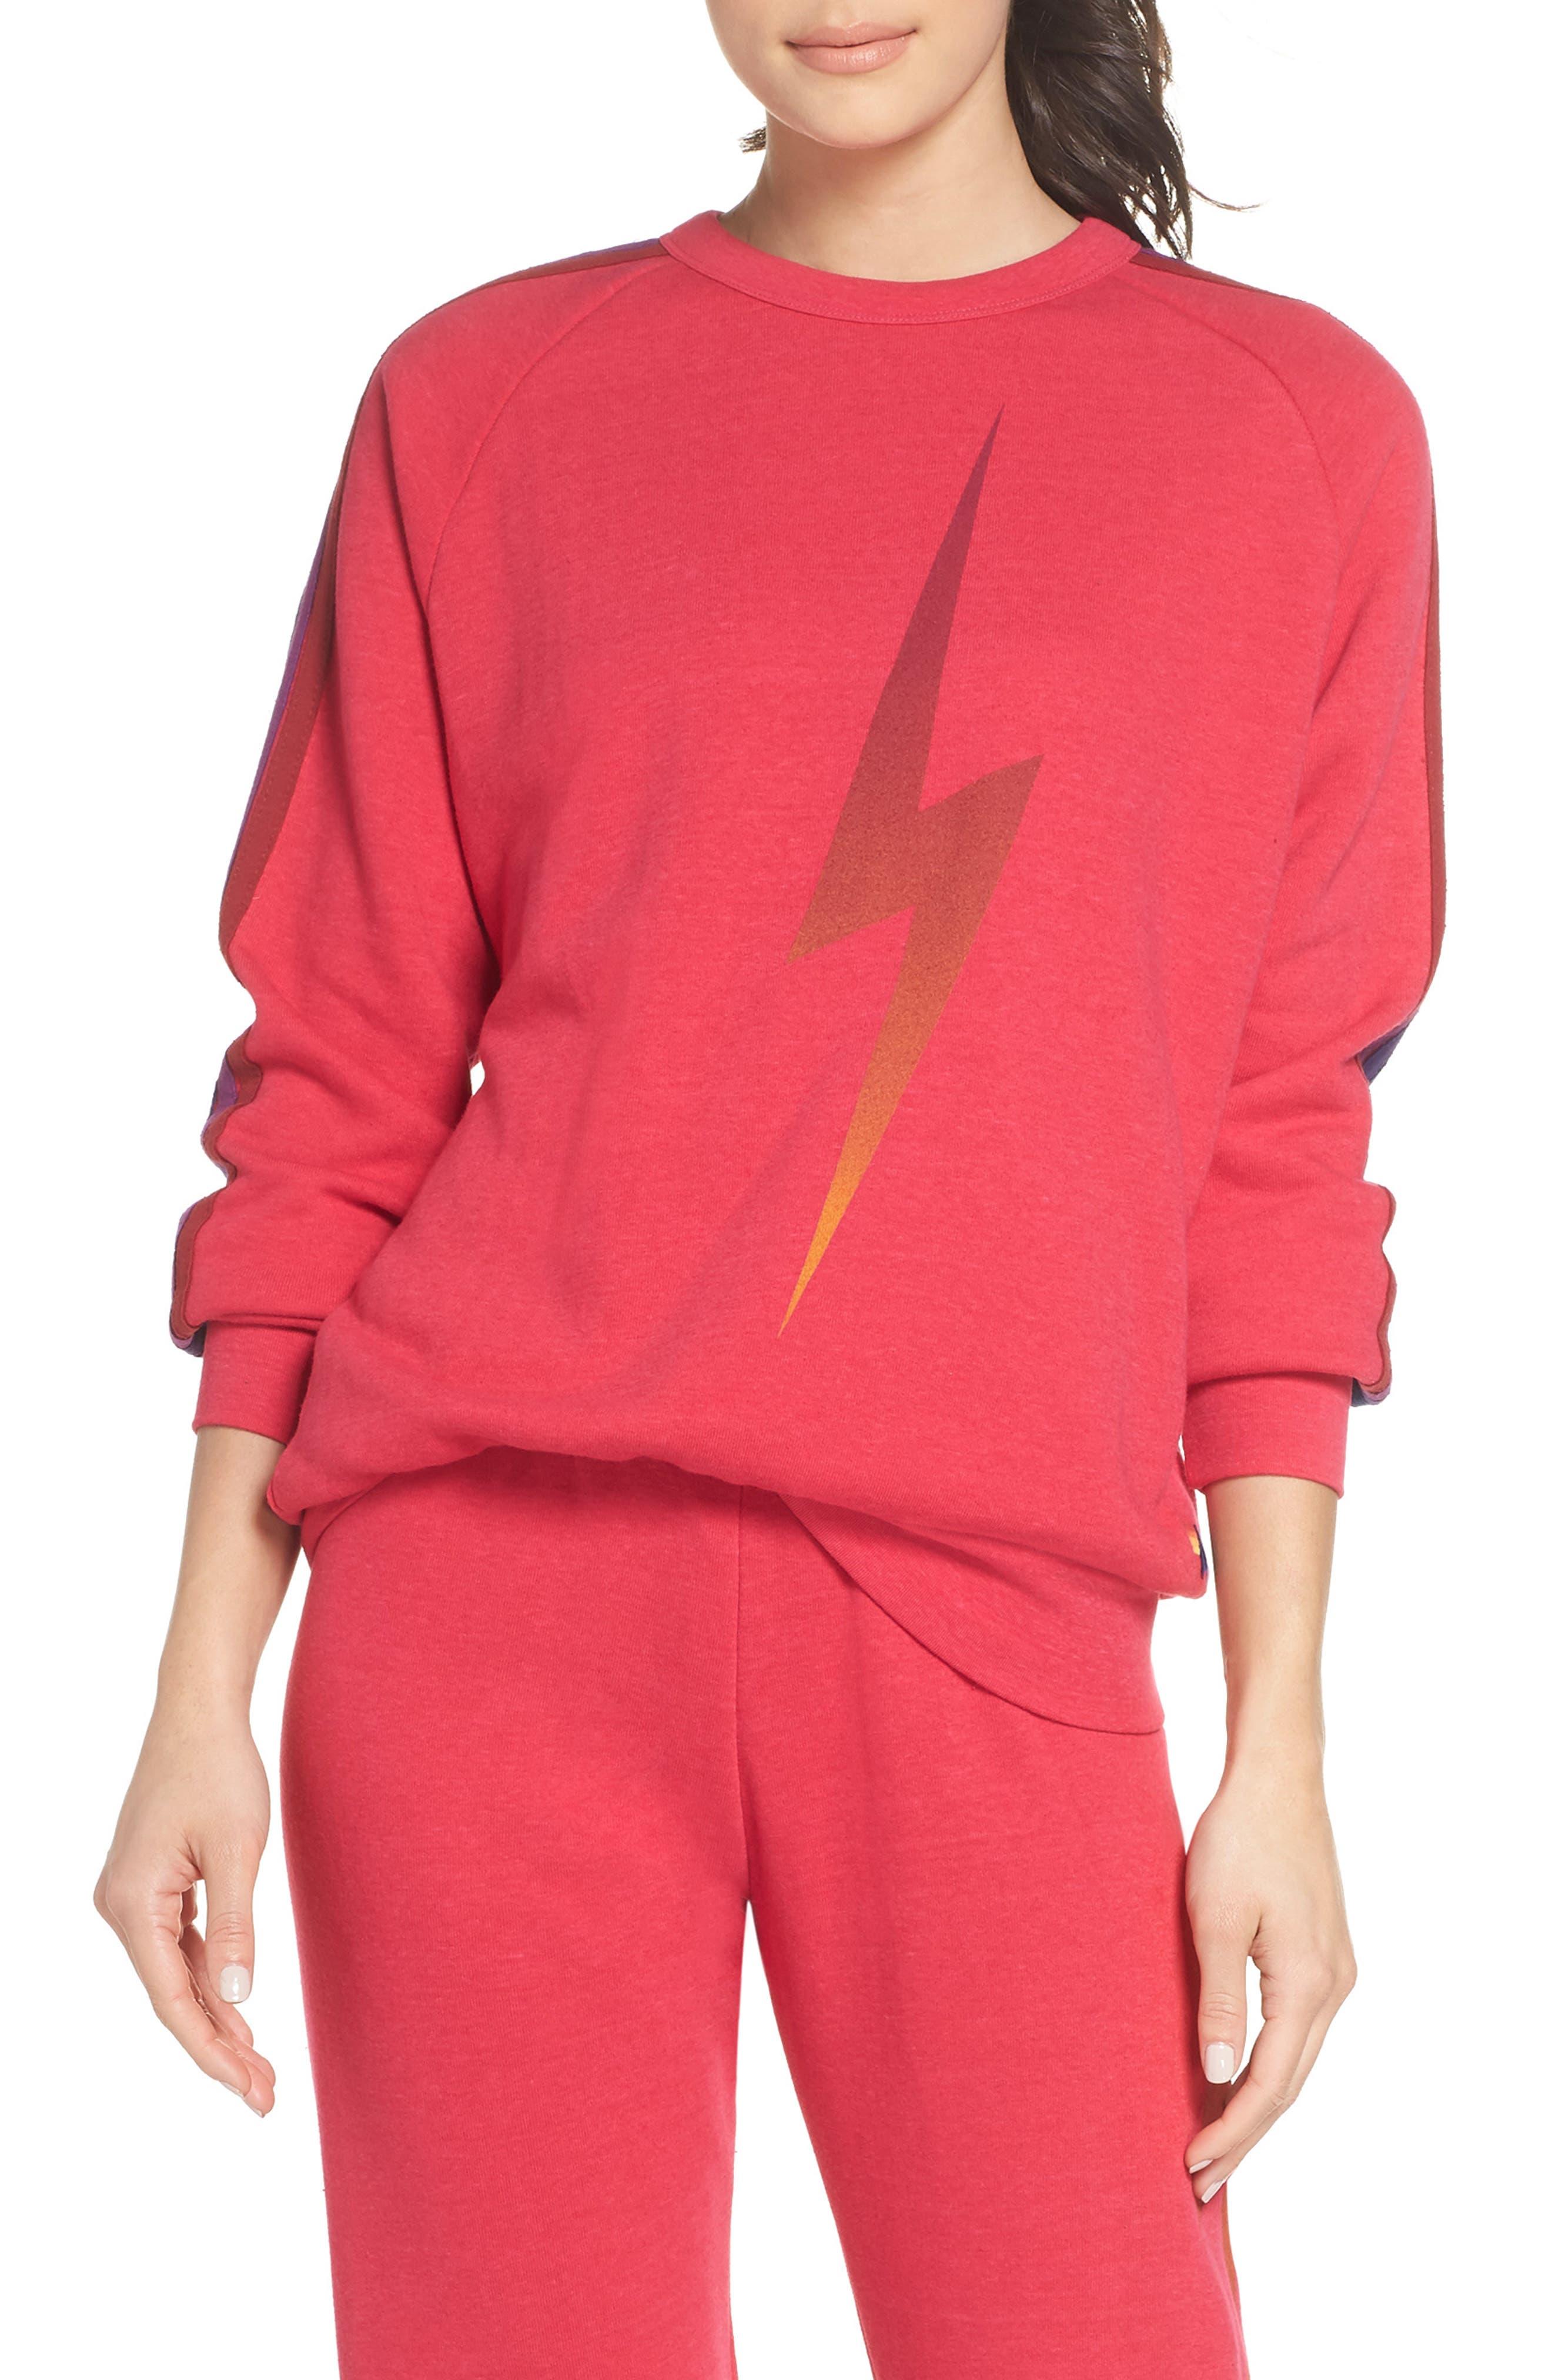 AVIATOR NATION Bolt Fade Sweatshirt in Rose/ Purple